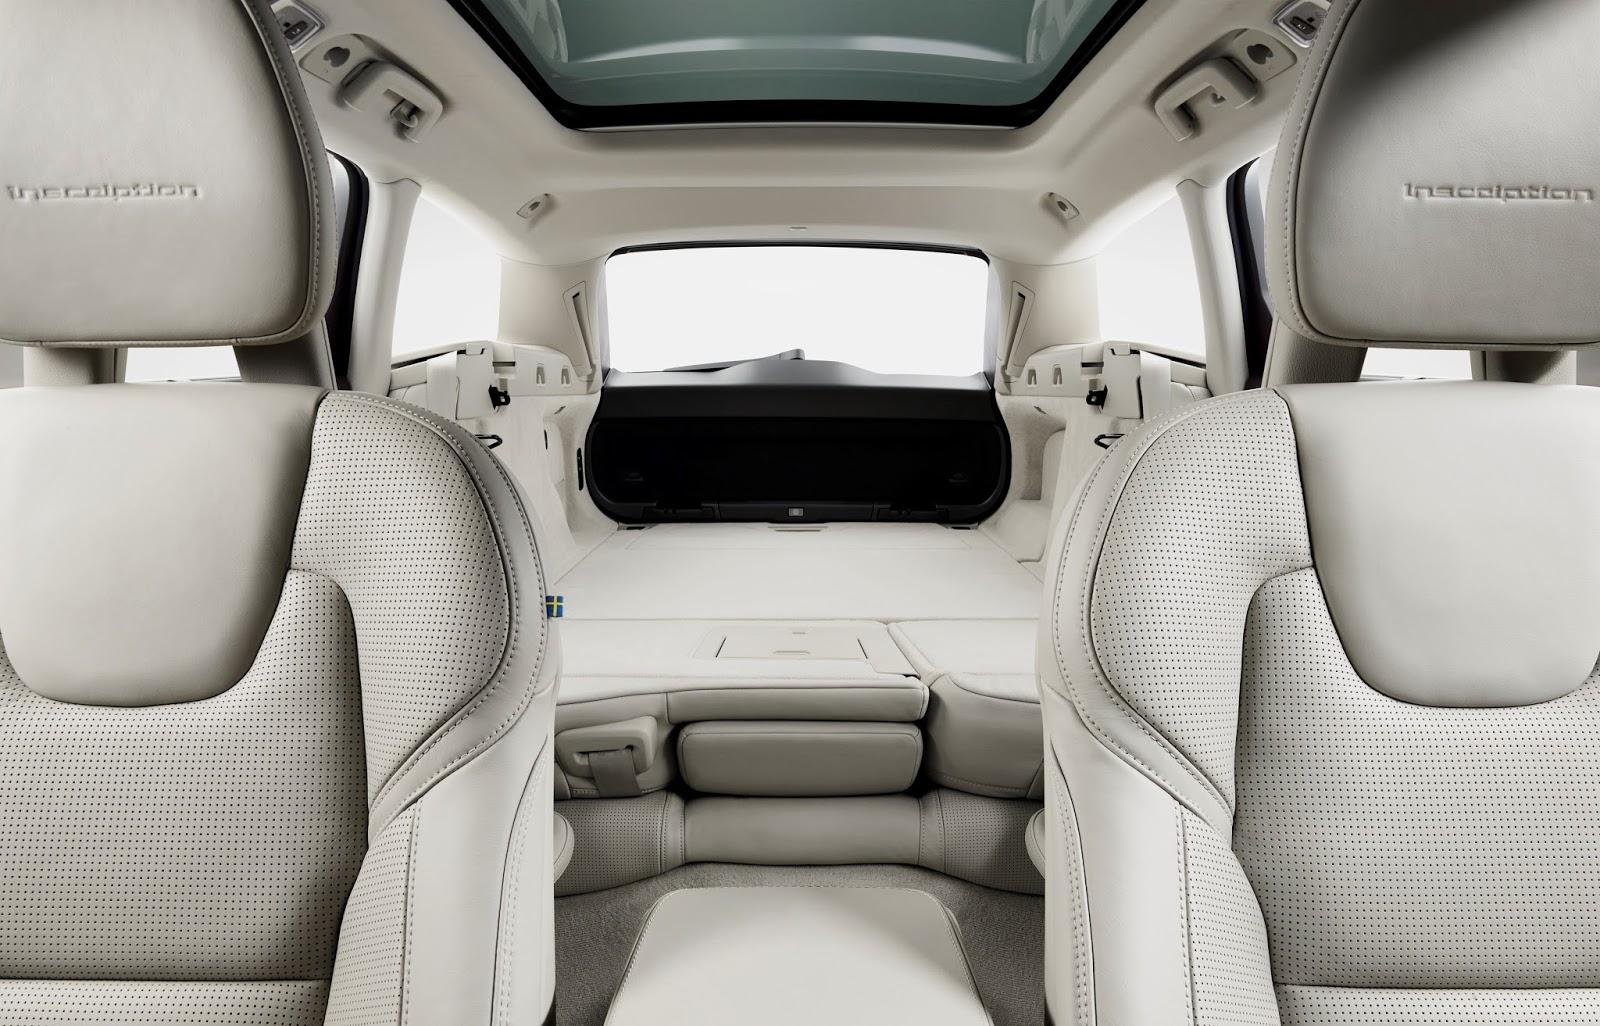 173841 Volvo V90 Studio Folding Rear seats Το V90 είναι το πιο όμορφο, το πιο ασφαλές station wagon και το πιο... Volvo Station Wagon, Volvo, Volvo V90